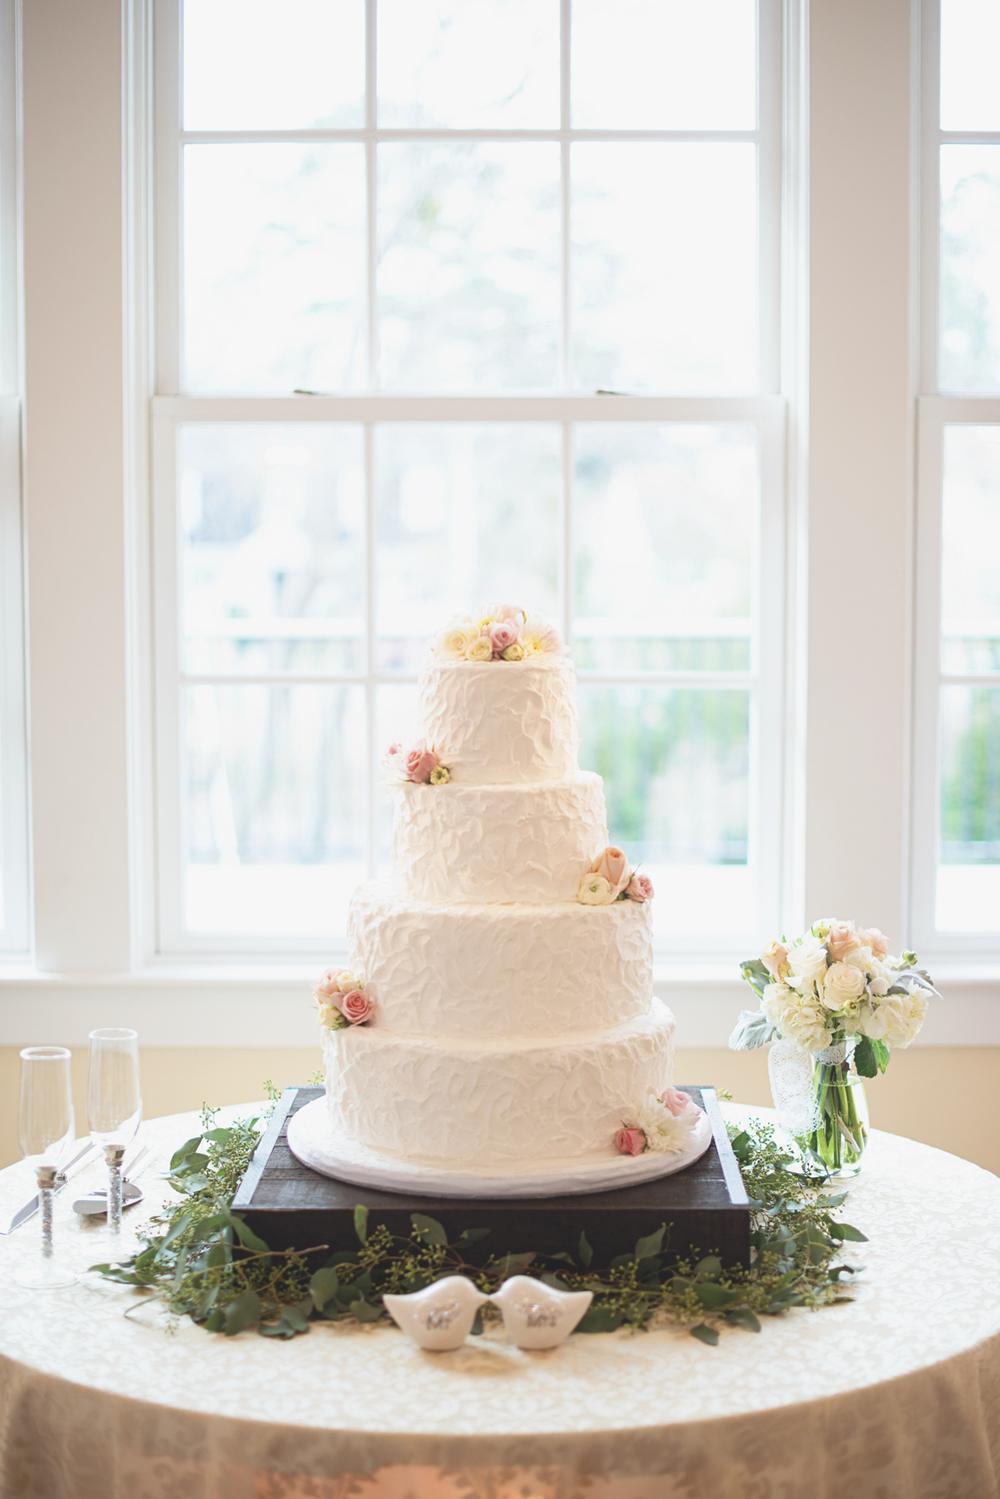 Blush, mint, and ivory spring wedding | Buttercream wedding cake